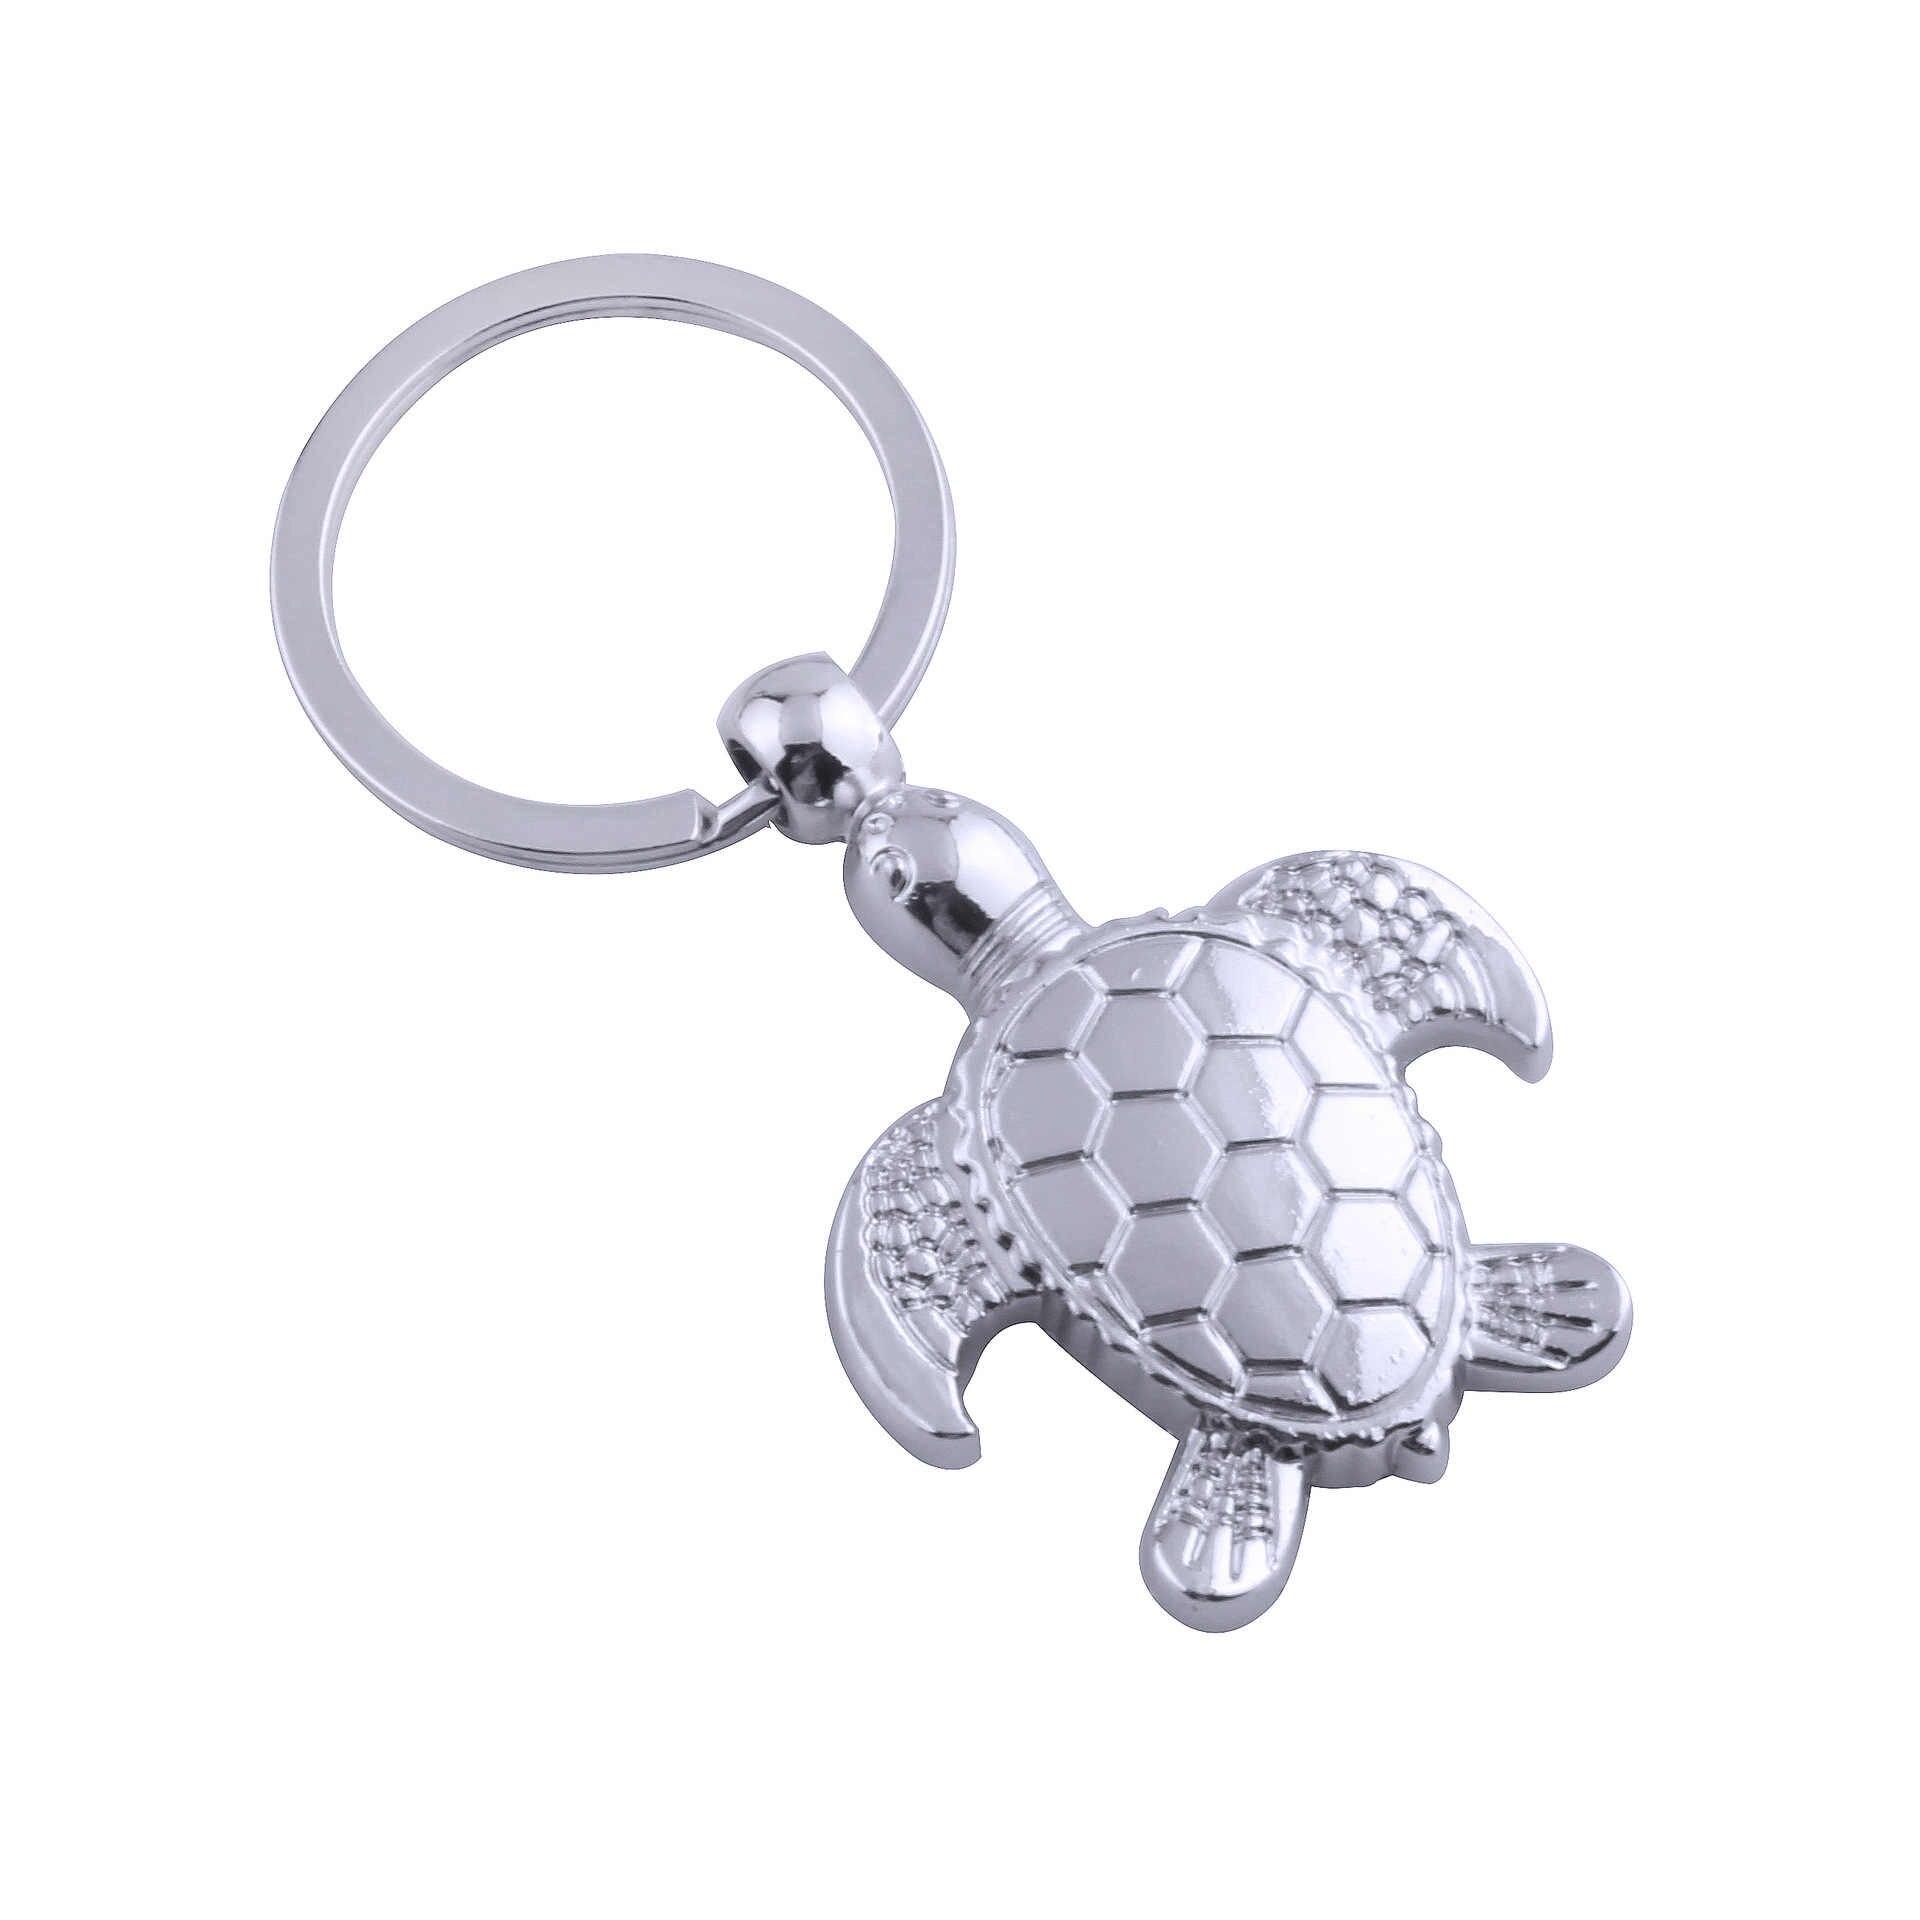 75cb5f0483 ... Fashion Tortoise Key Chain personality Animal Pendant Car Key Holder  simulation Sea turtle Keychain Bag Charm ...